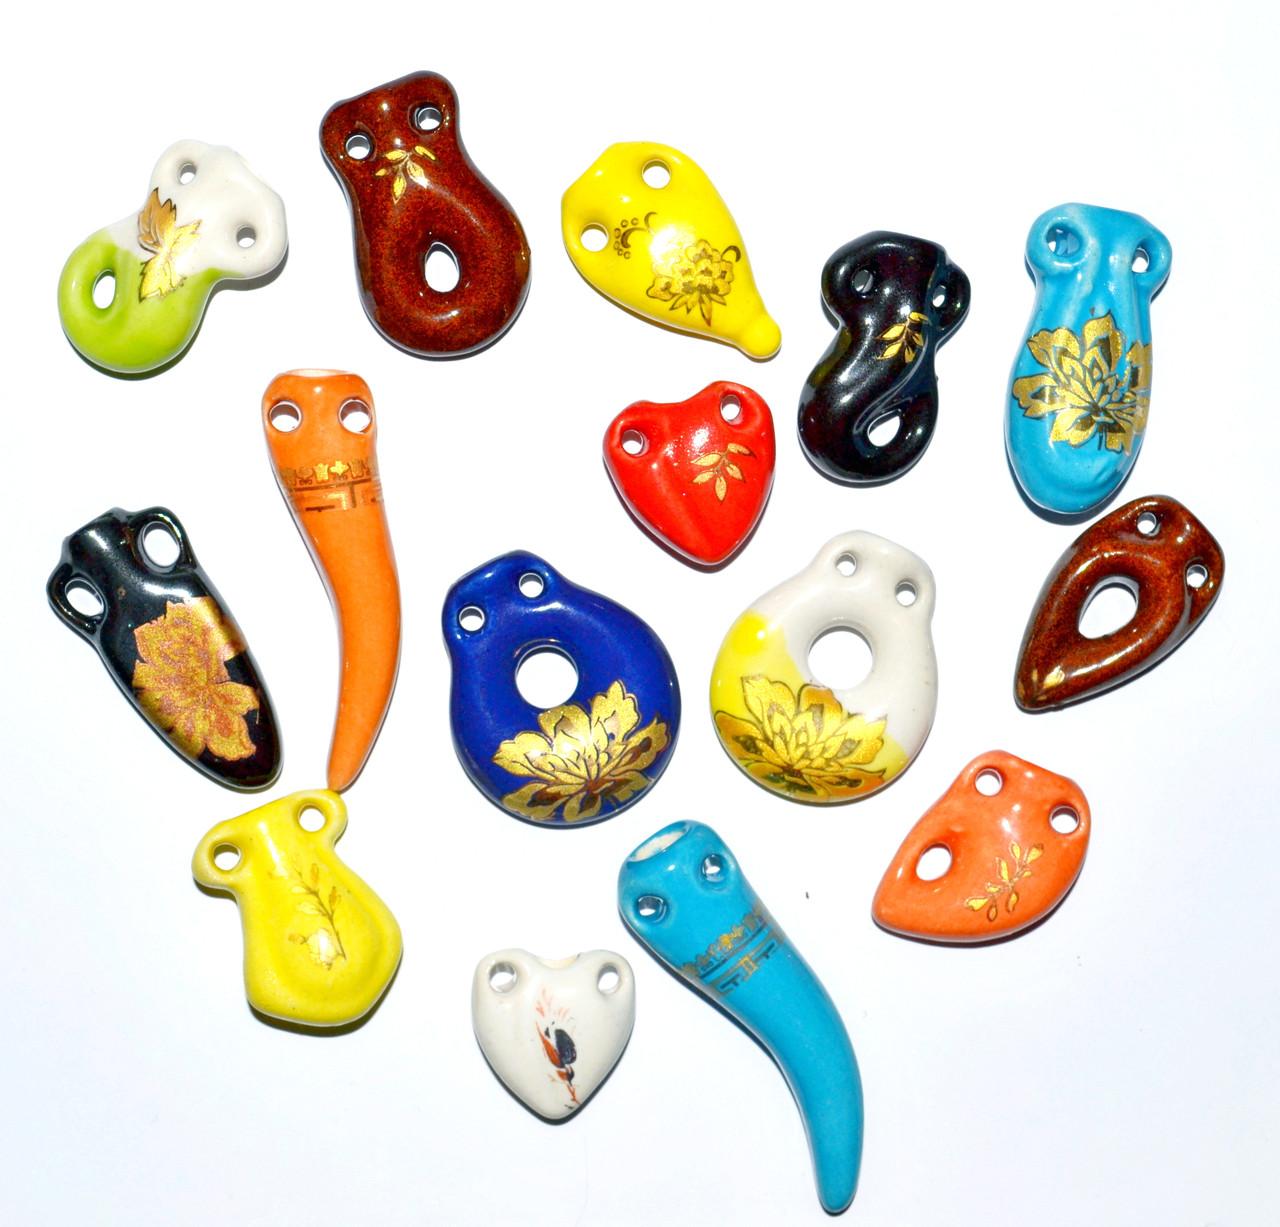 Аромакулон, Аромамедальон,в ассортименте, на шелковом шнурке, керамический